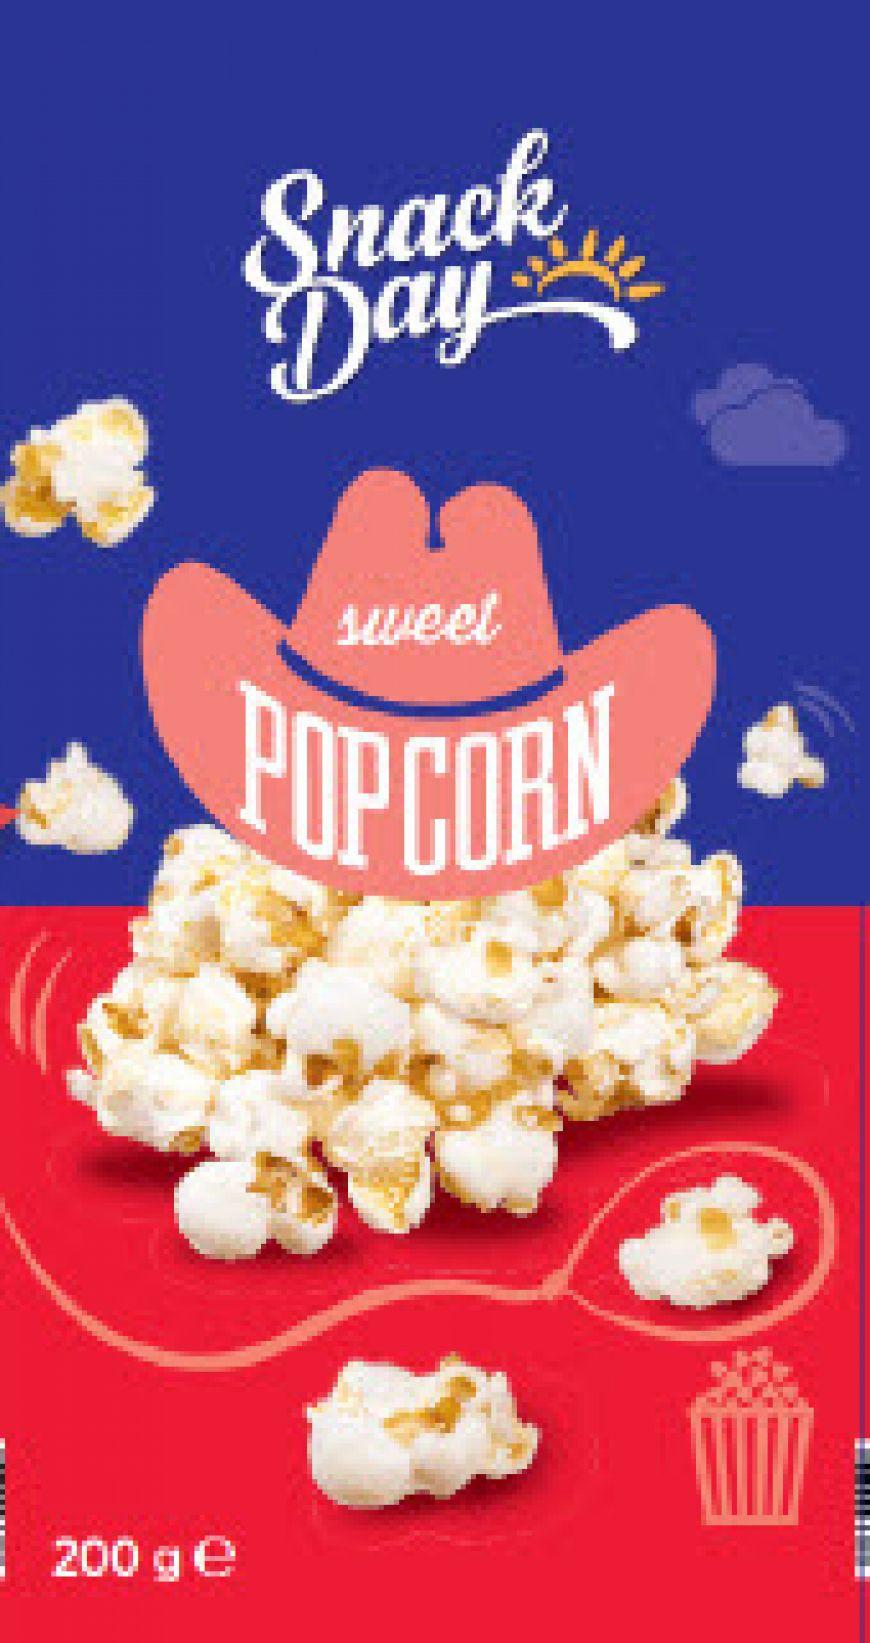 Lidl Popcorn